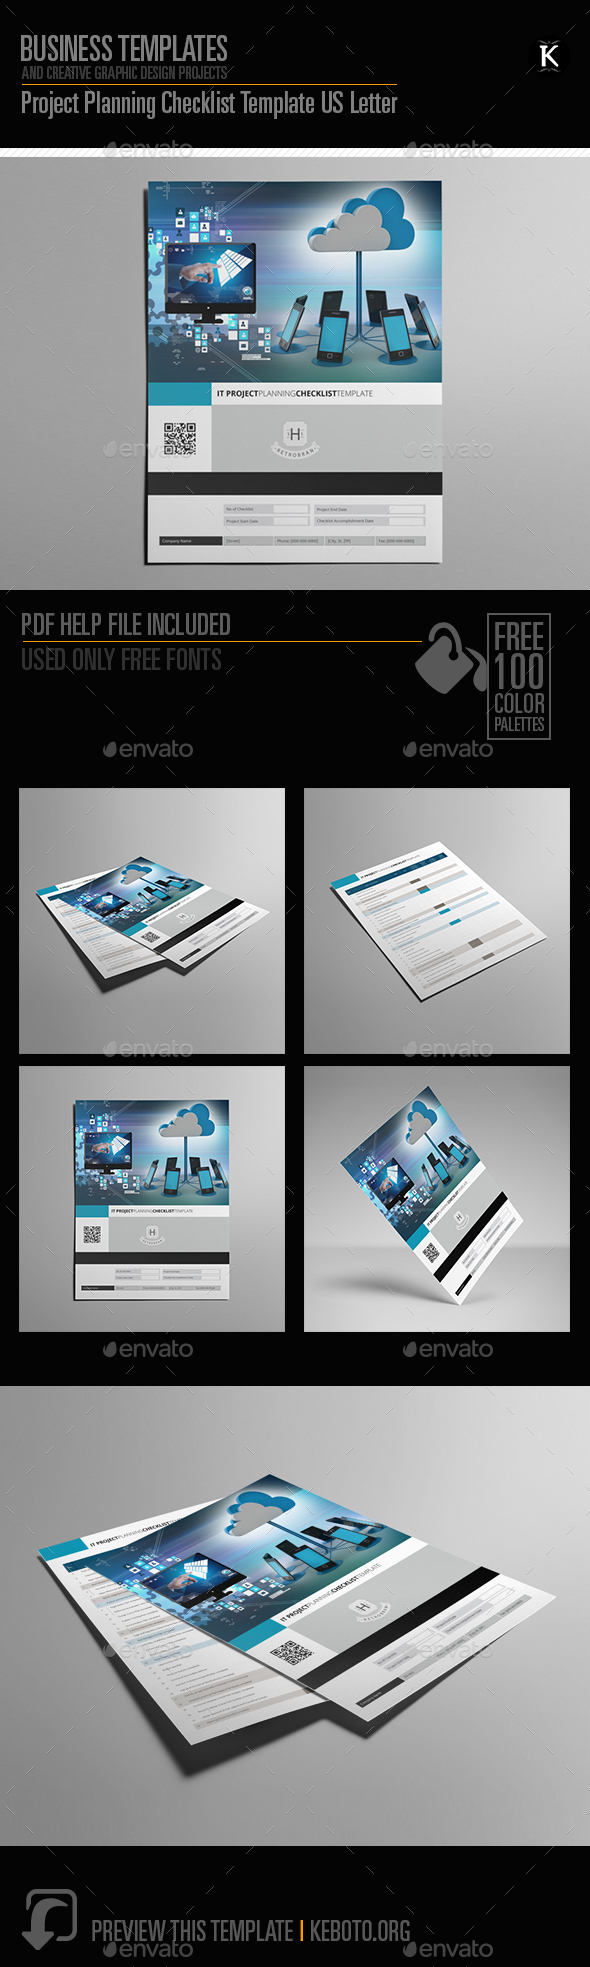 Checklist Template Graphics Designs Templates